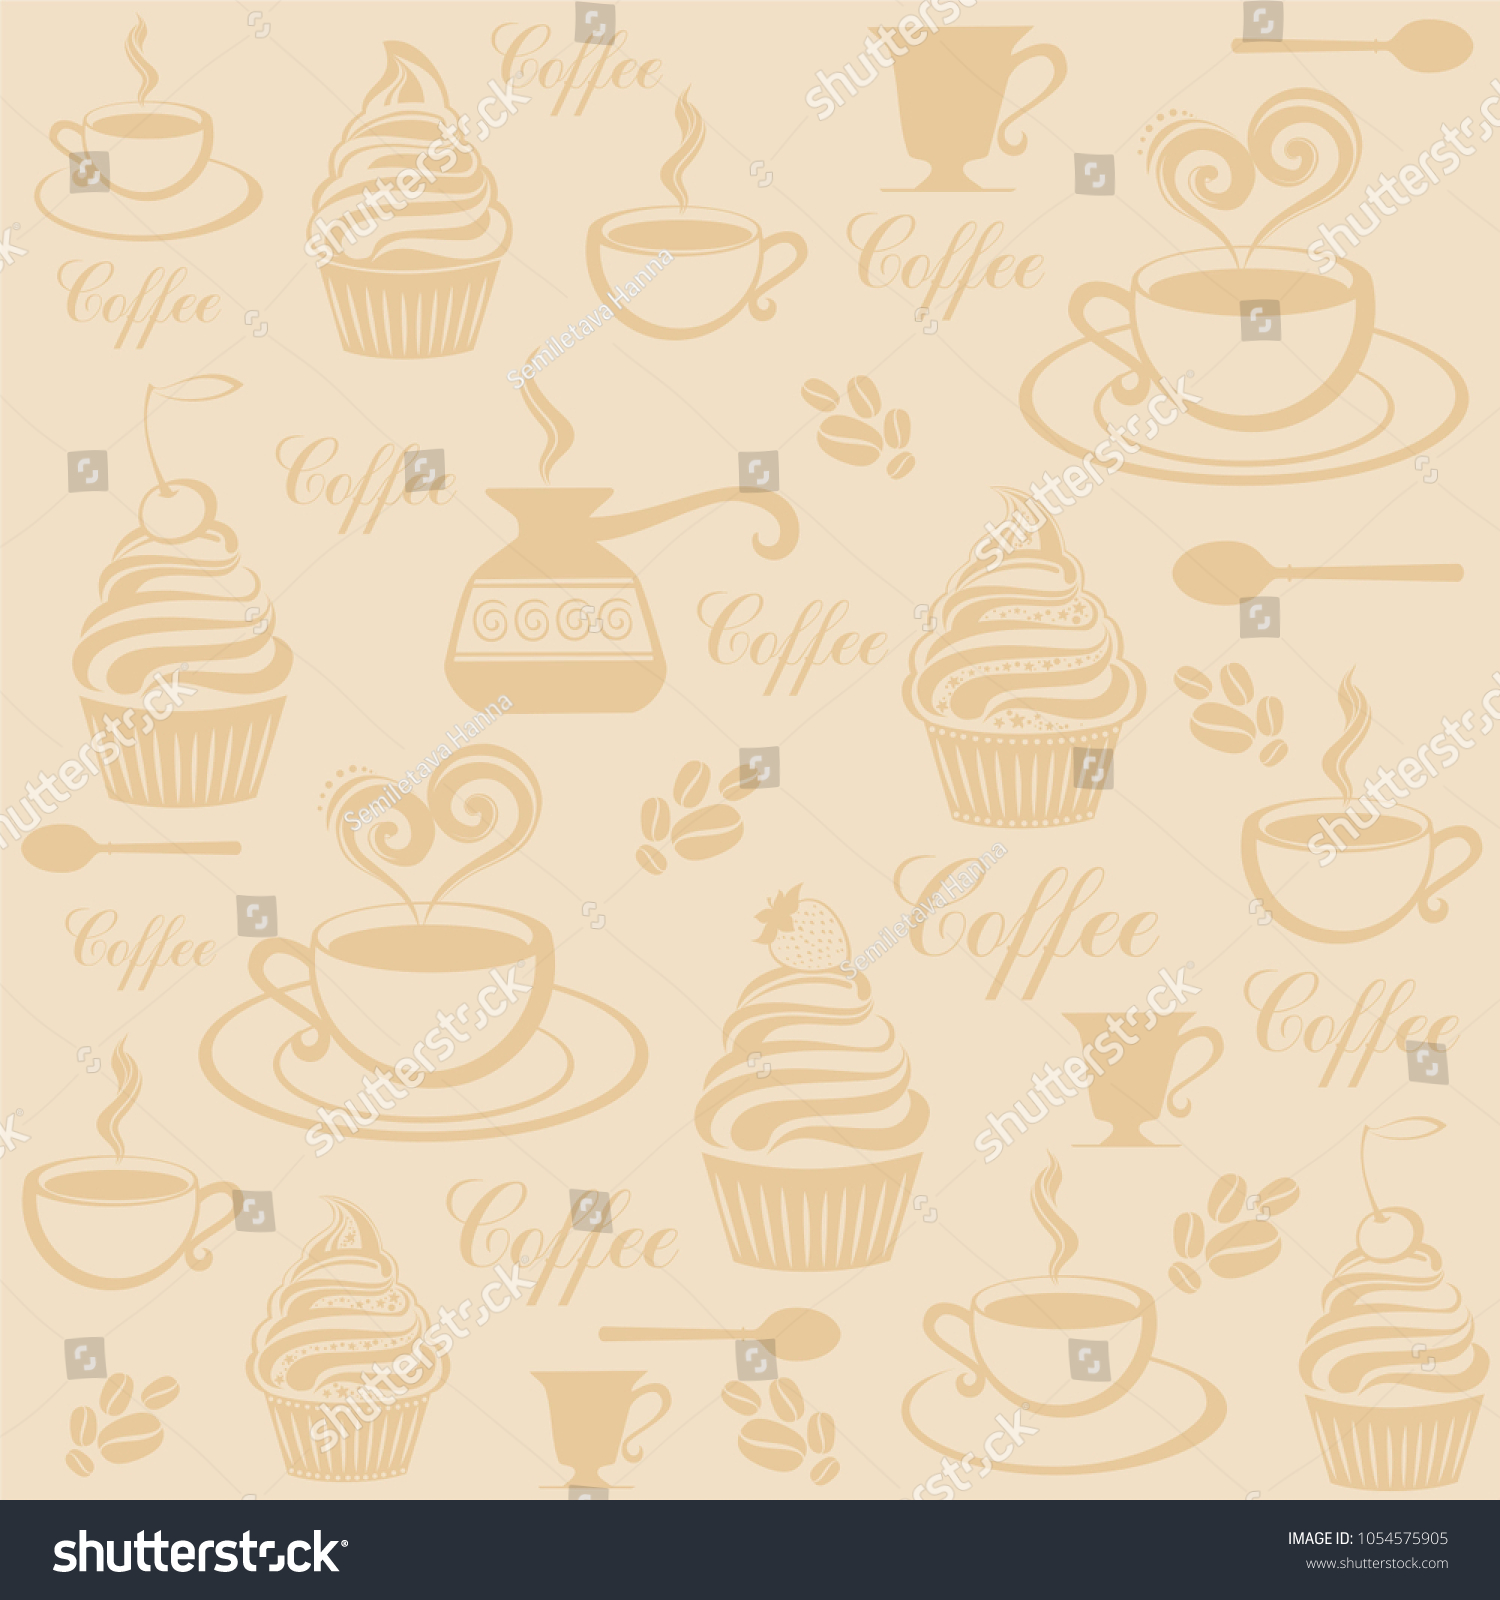 Seamless Coffee Wallpaper Vintage Restaurant Menu Food And Drink Doodles Pattern Illustration